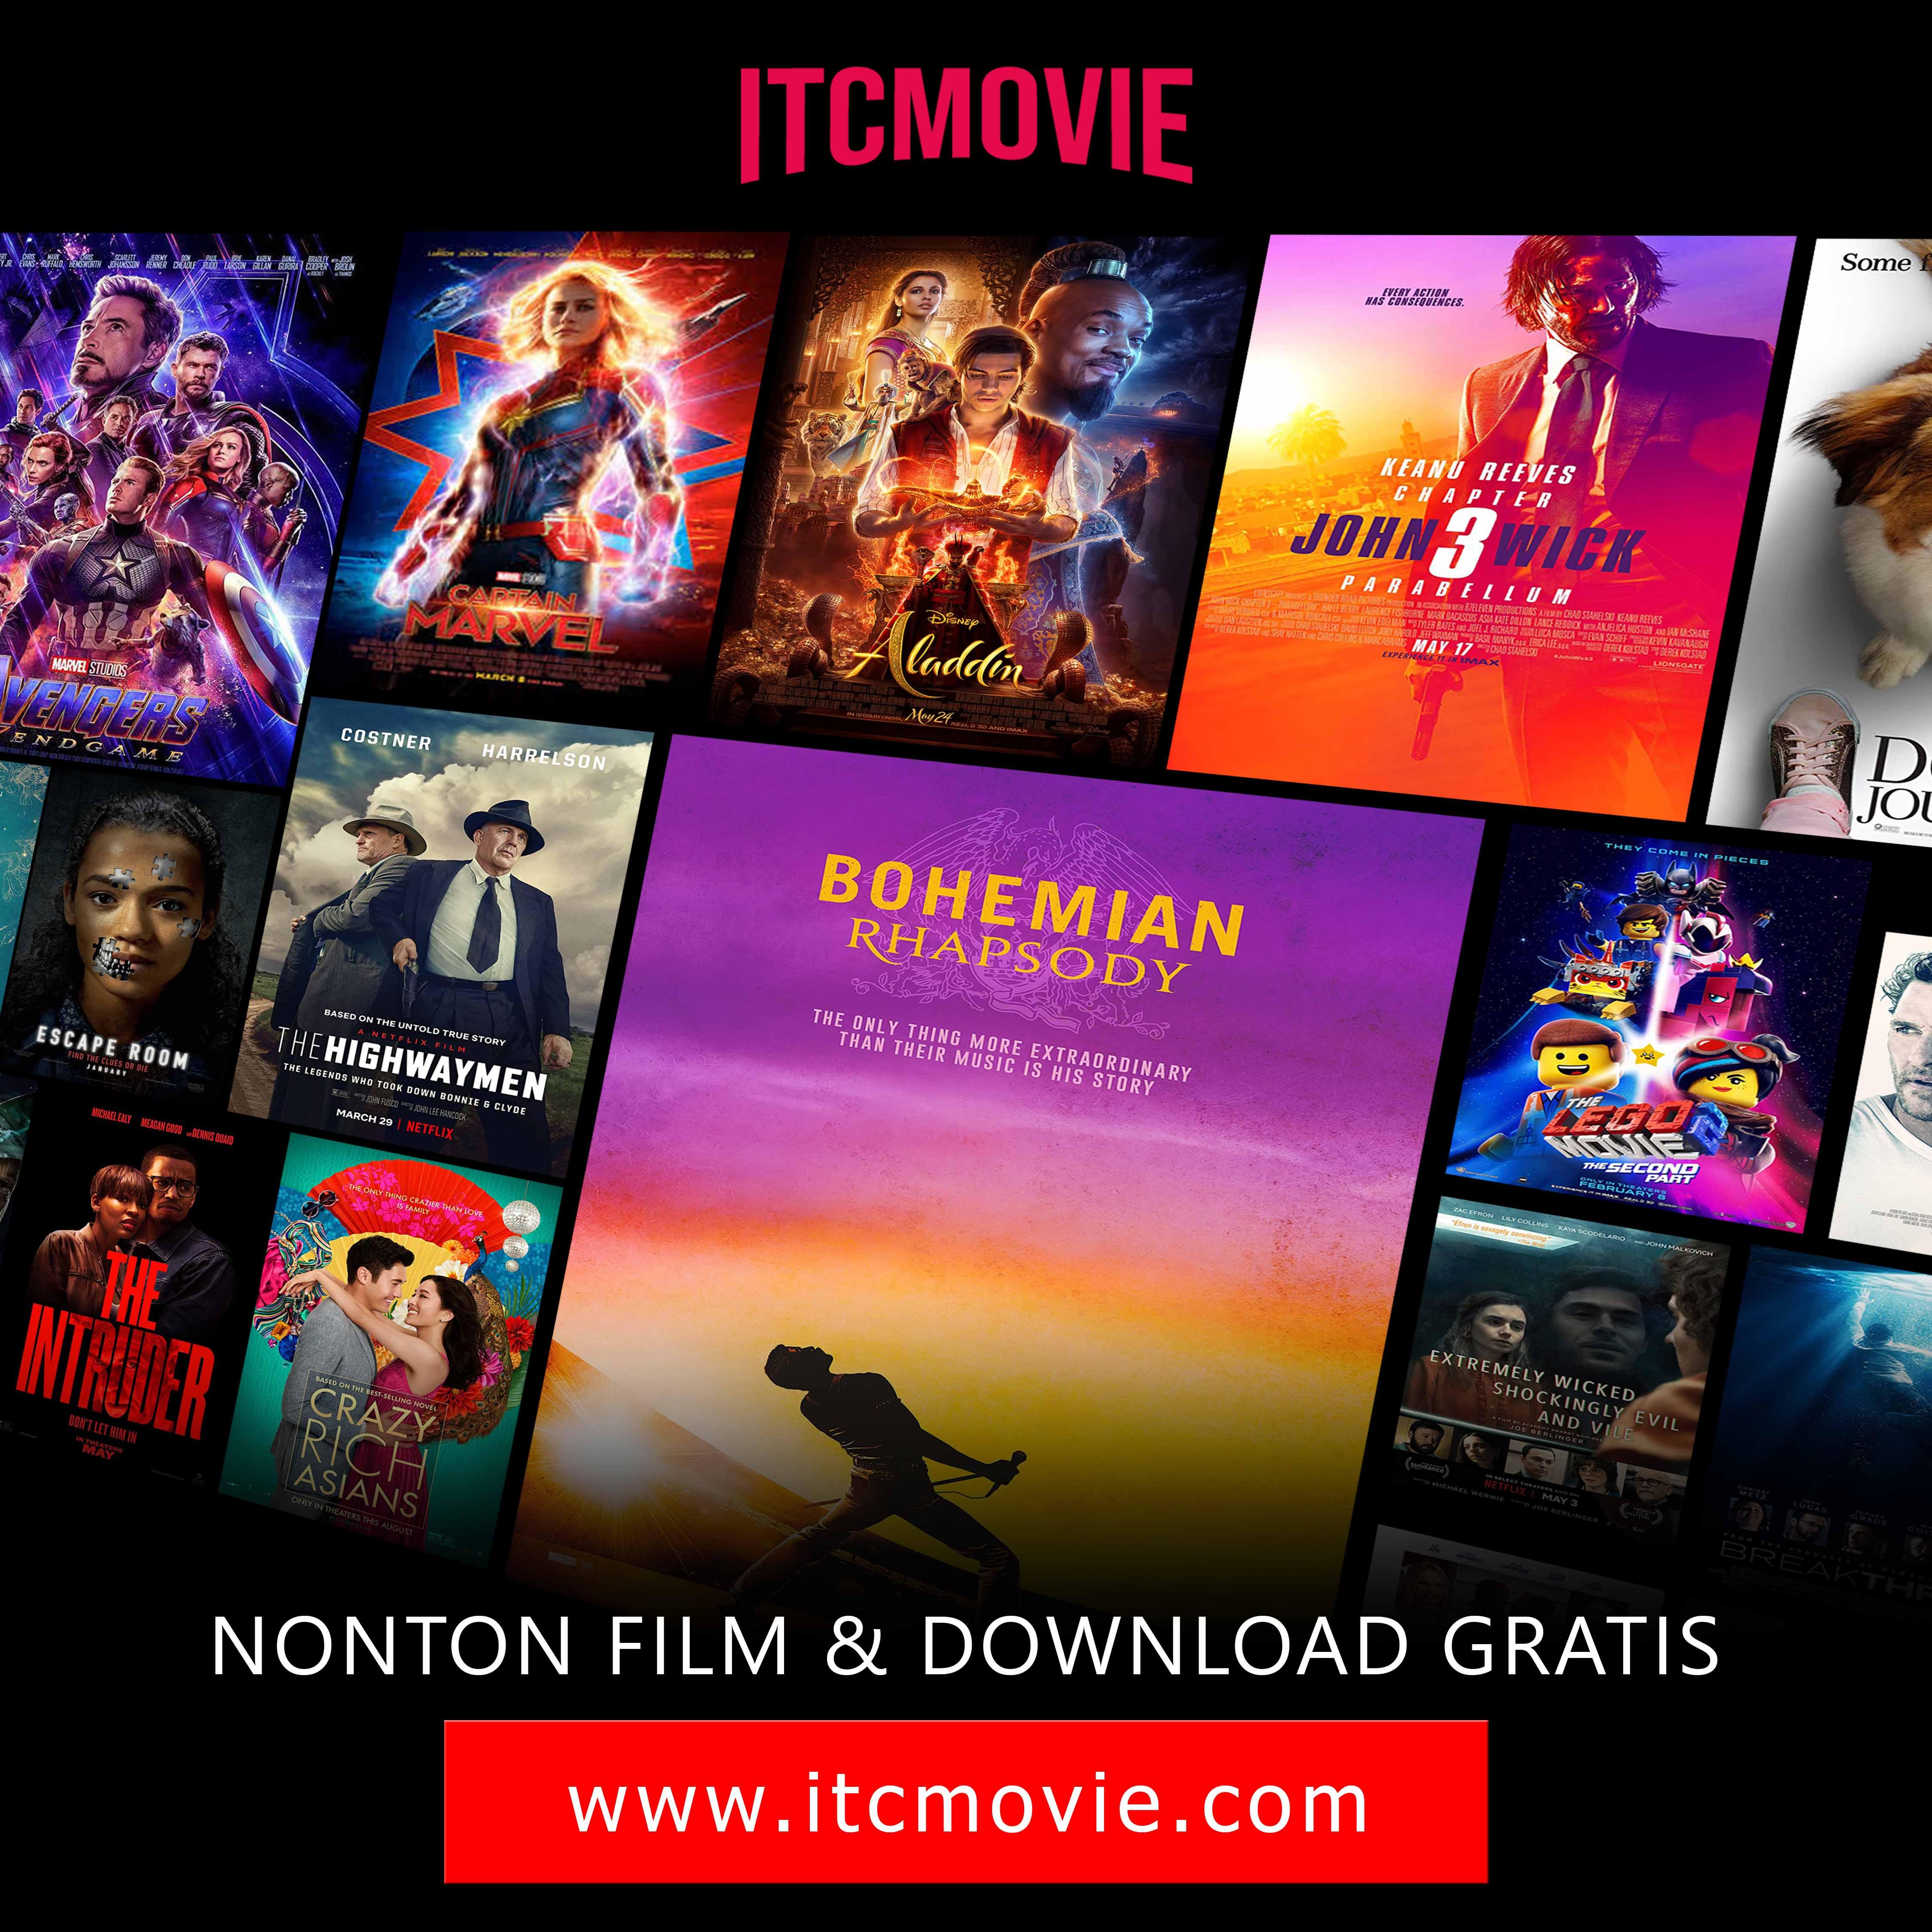 Nonton Film Online Terbaru Sub Indo 2019 di ITCMOVIE.COM